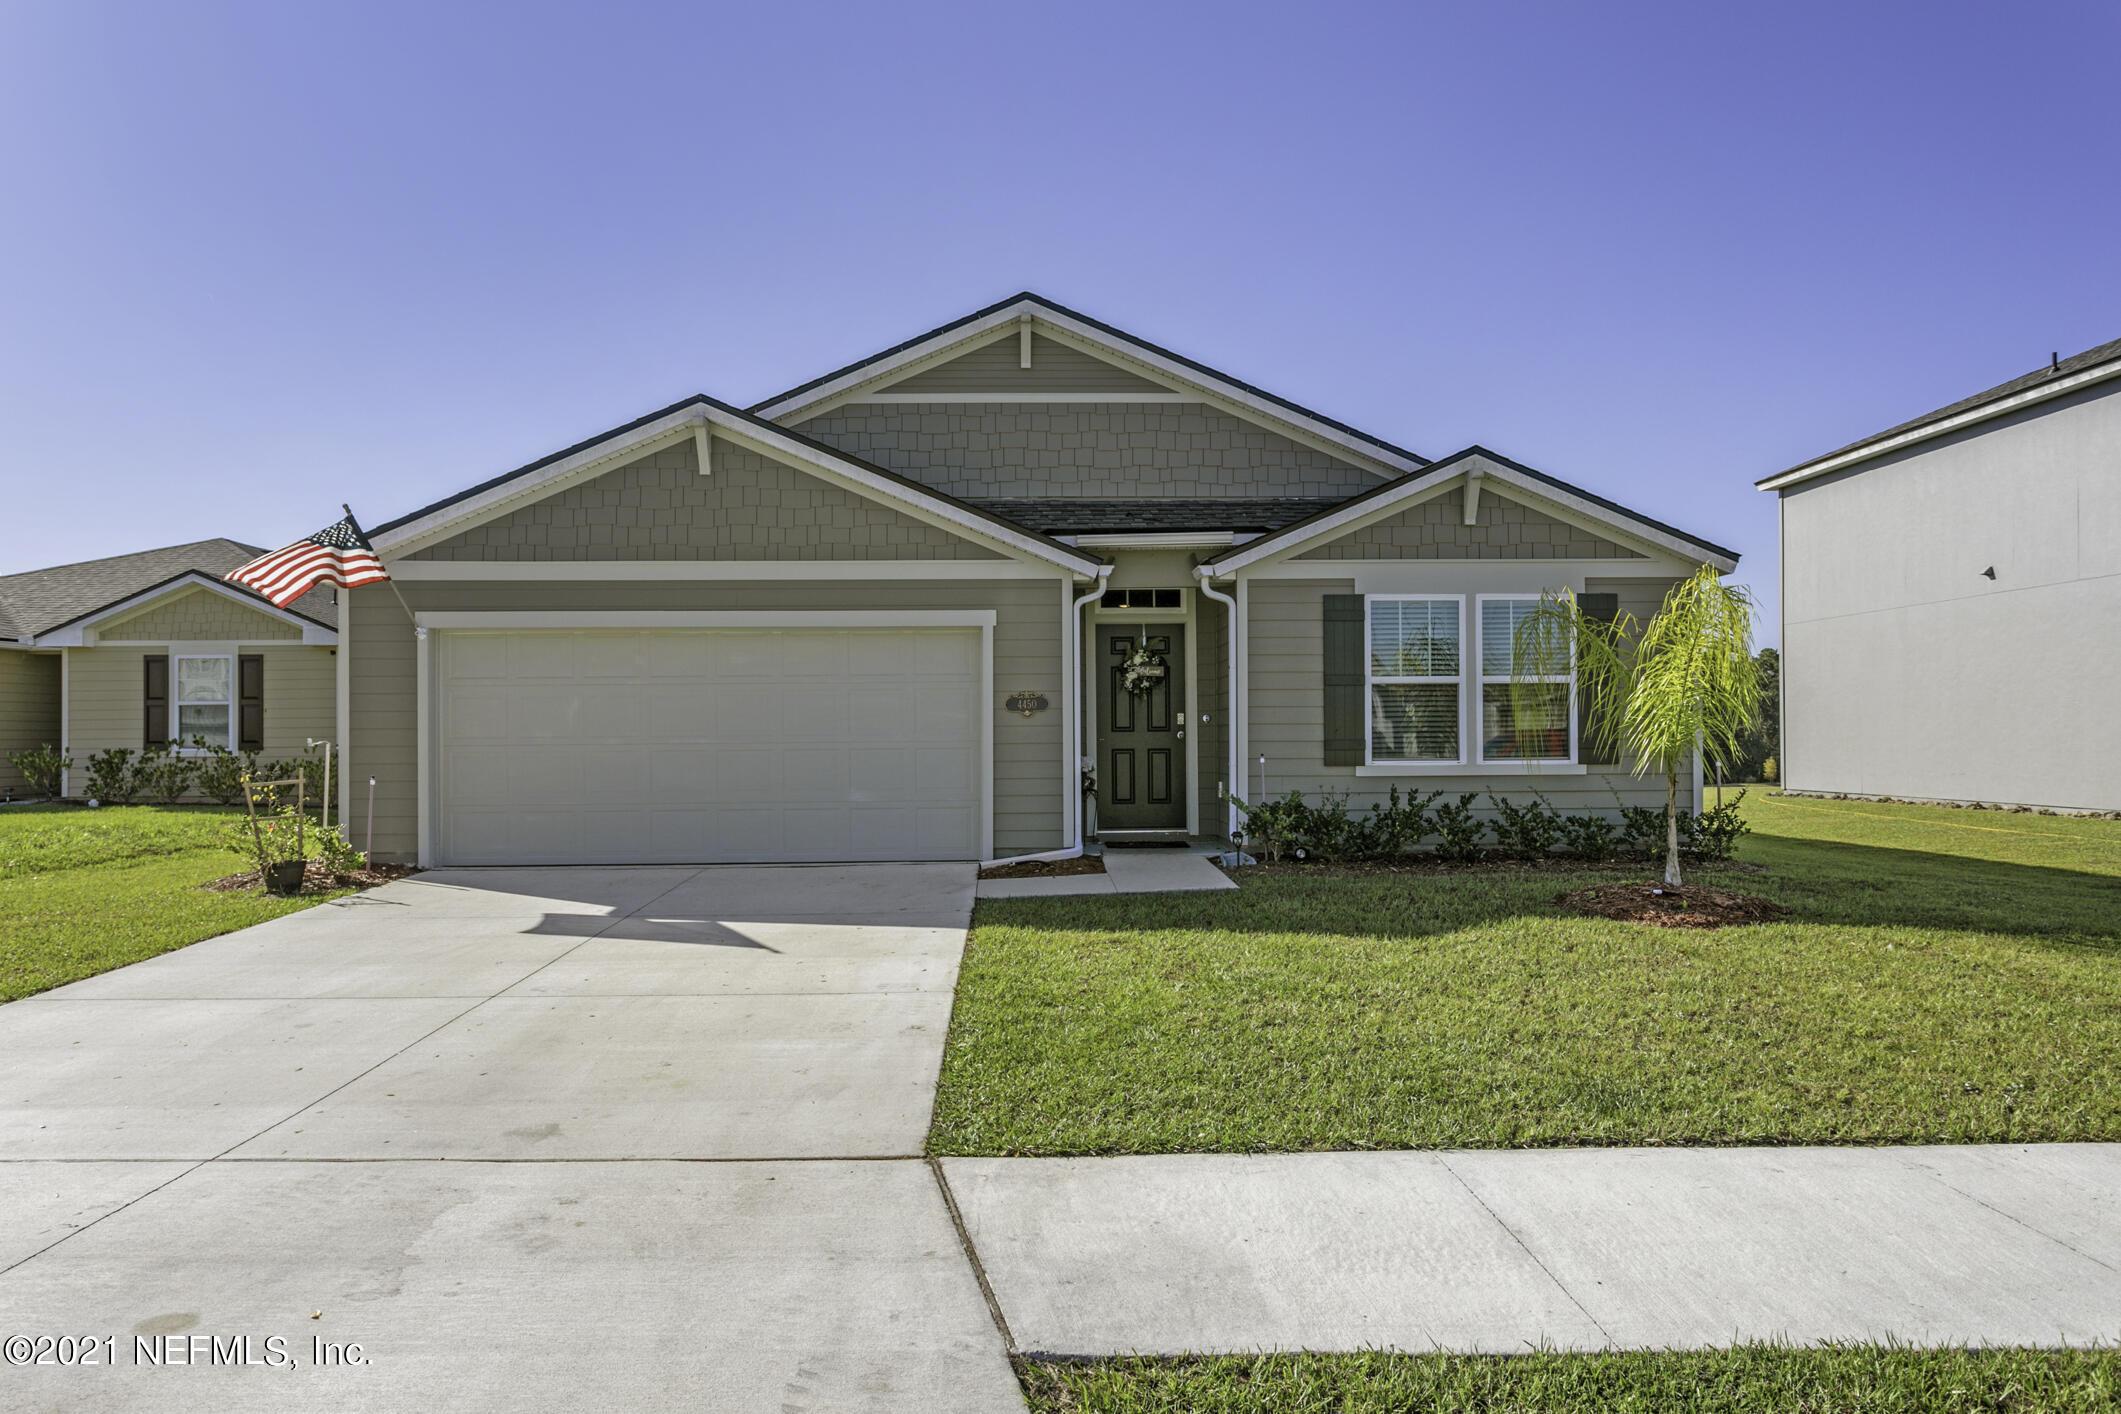 4450 WARM SPRINGS, MIDDLEBURG, FLORIDA 32068, 4 Bedrooms Bedrooms, ,2 BathroomsBathrooms,Residential,For sale,WARM SPRINGS,1136774